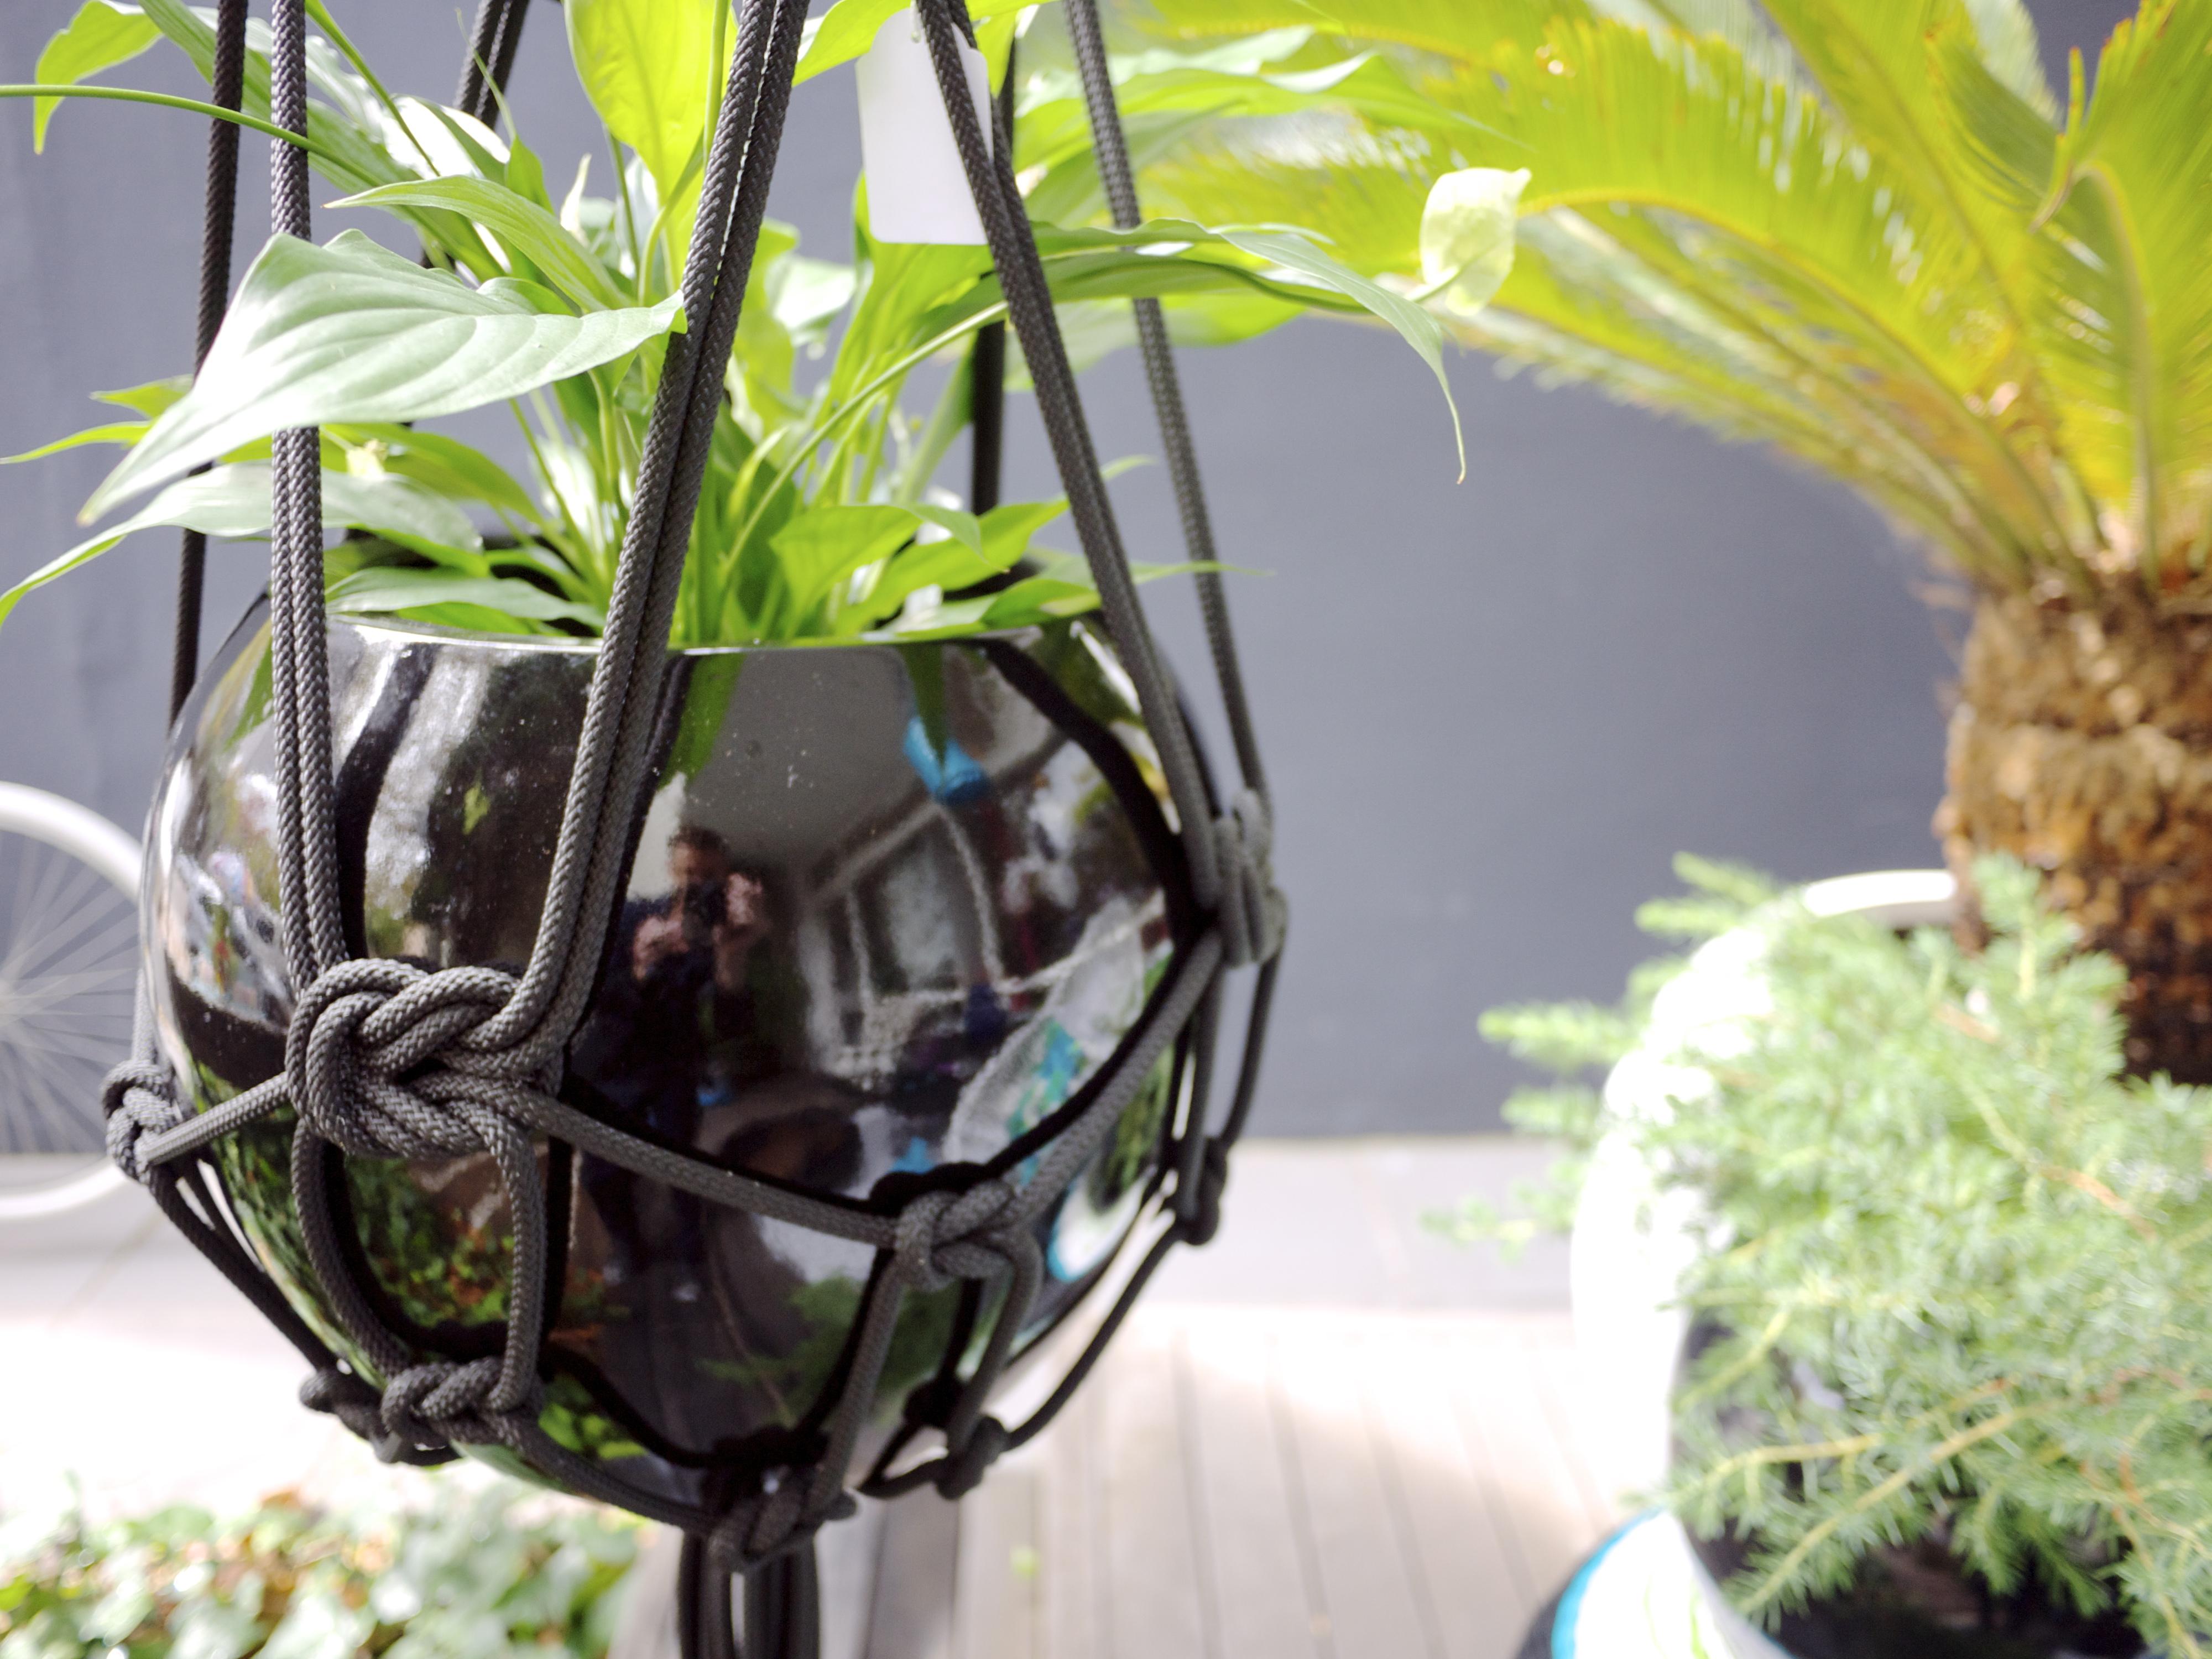 Terrace Outdoor Living - Black Pot and Hanger